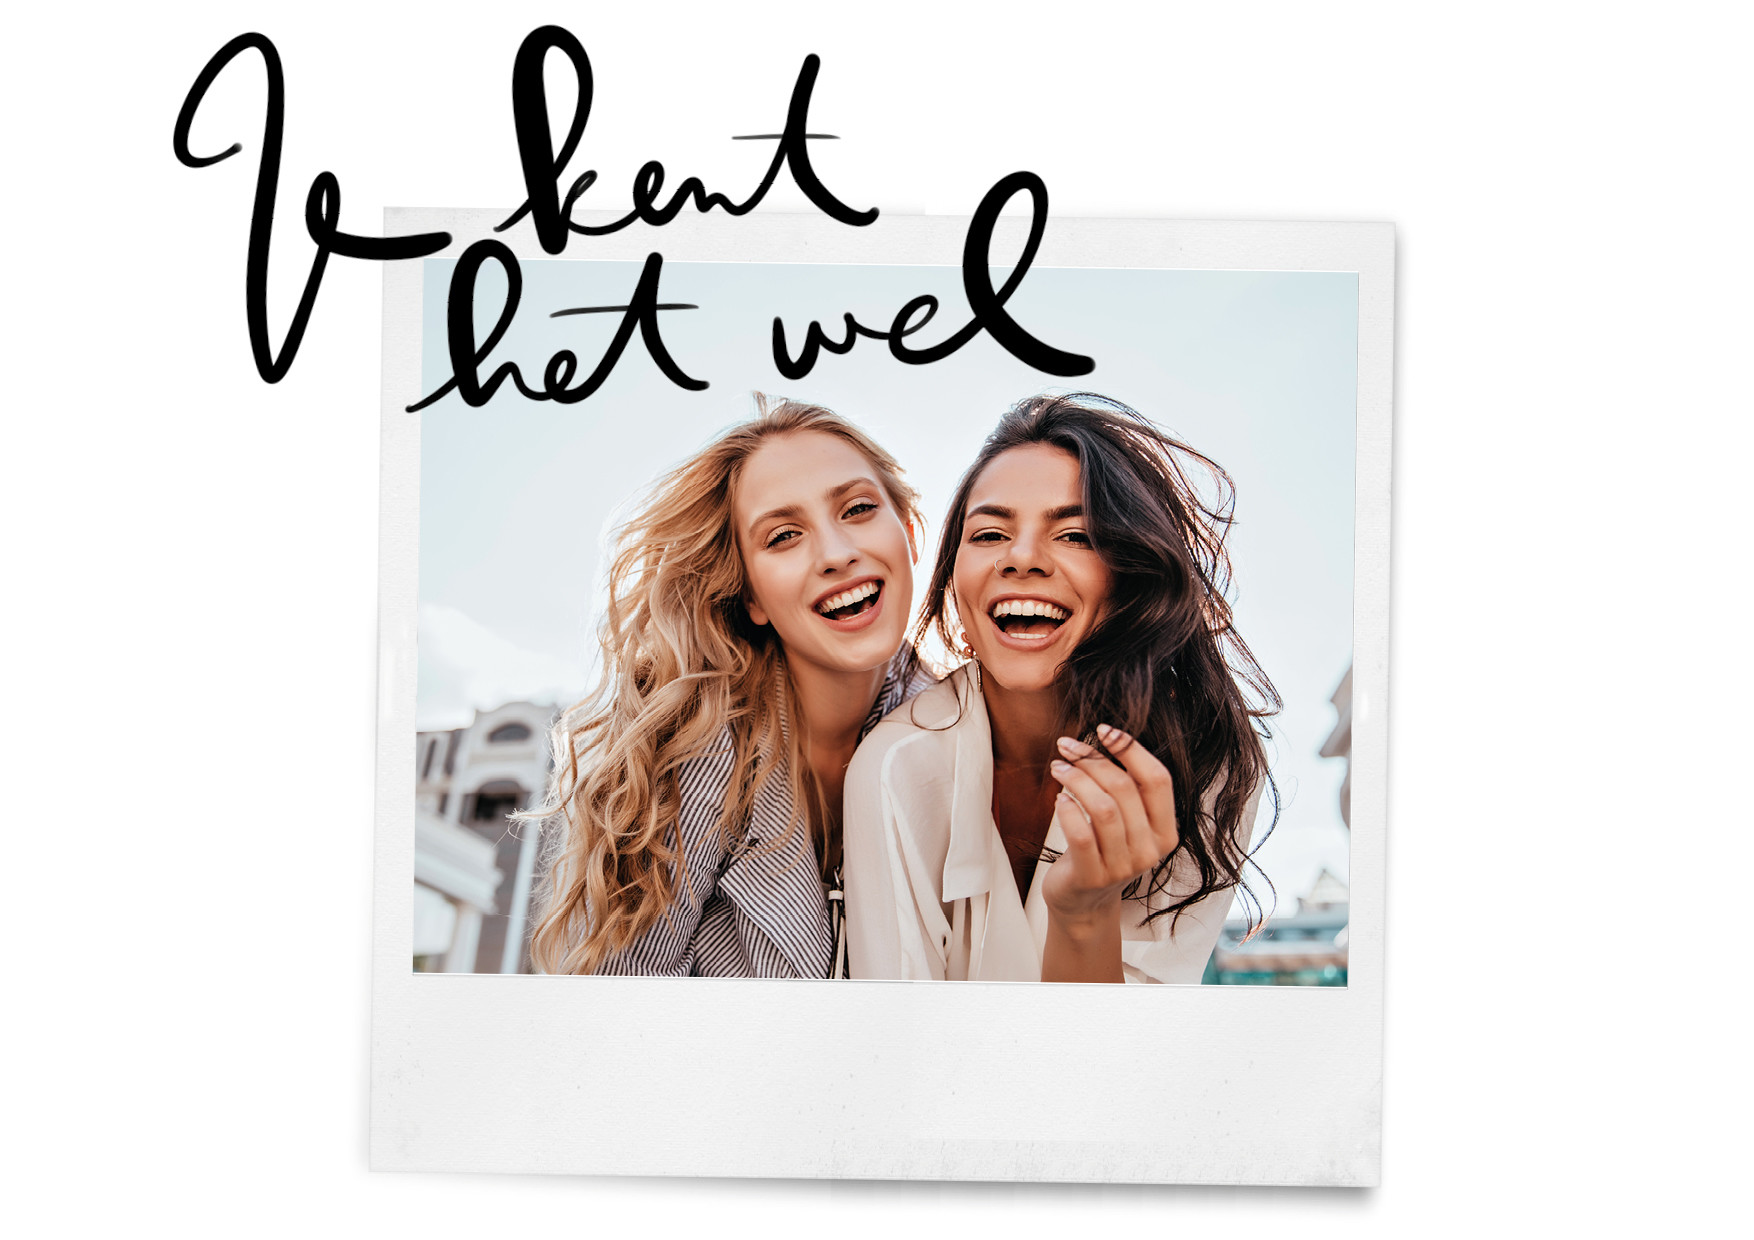 twee lachende vriendinnen in een polaroid